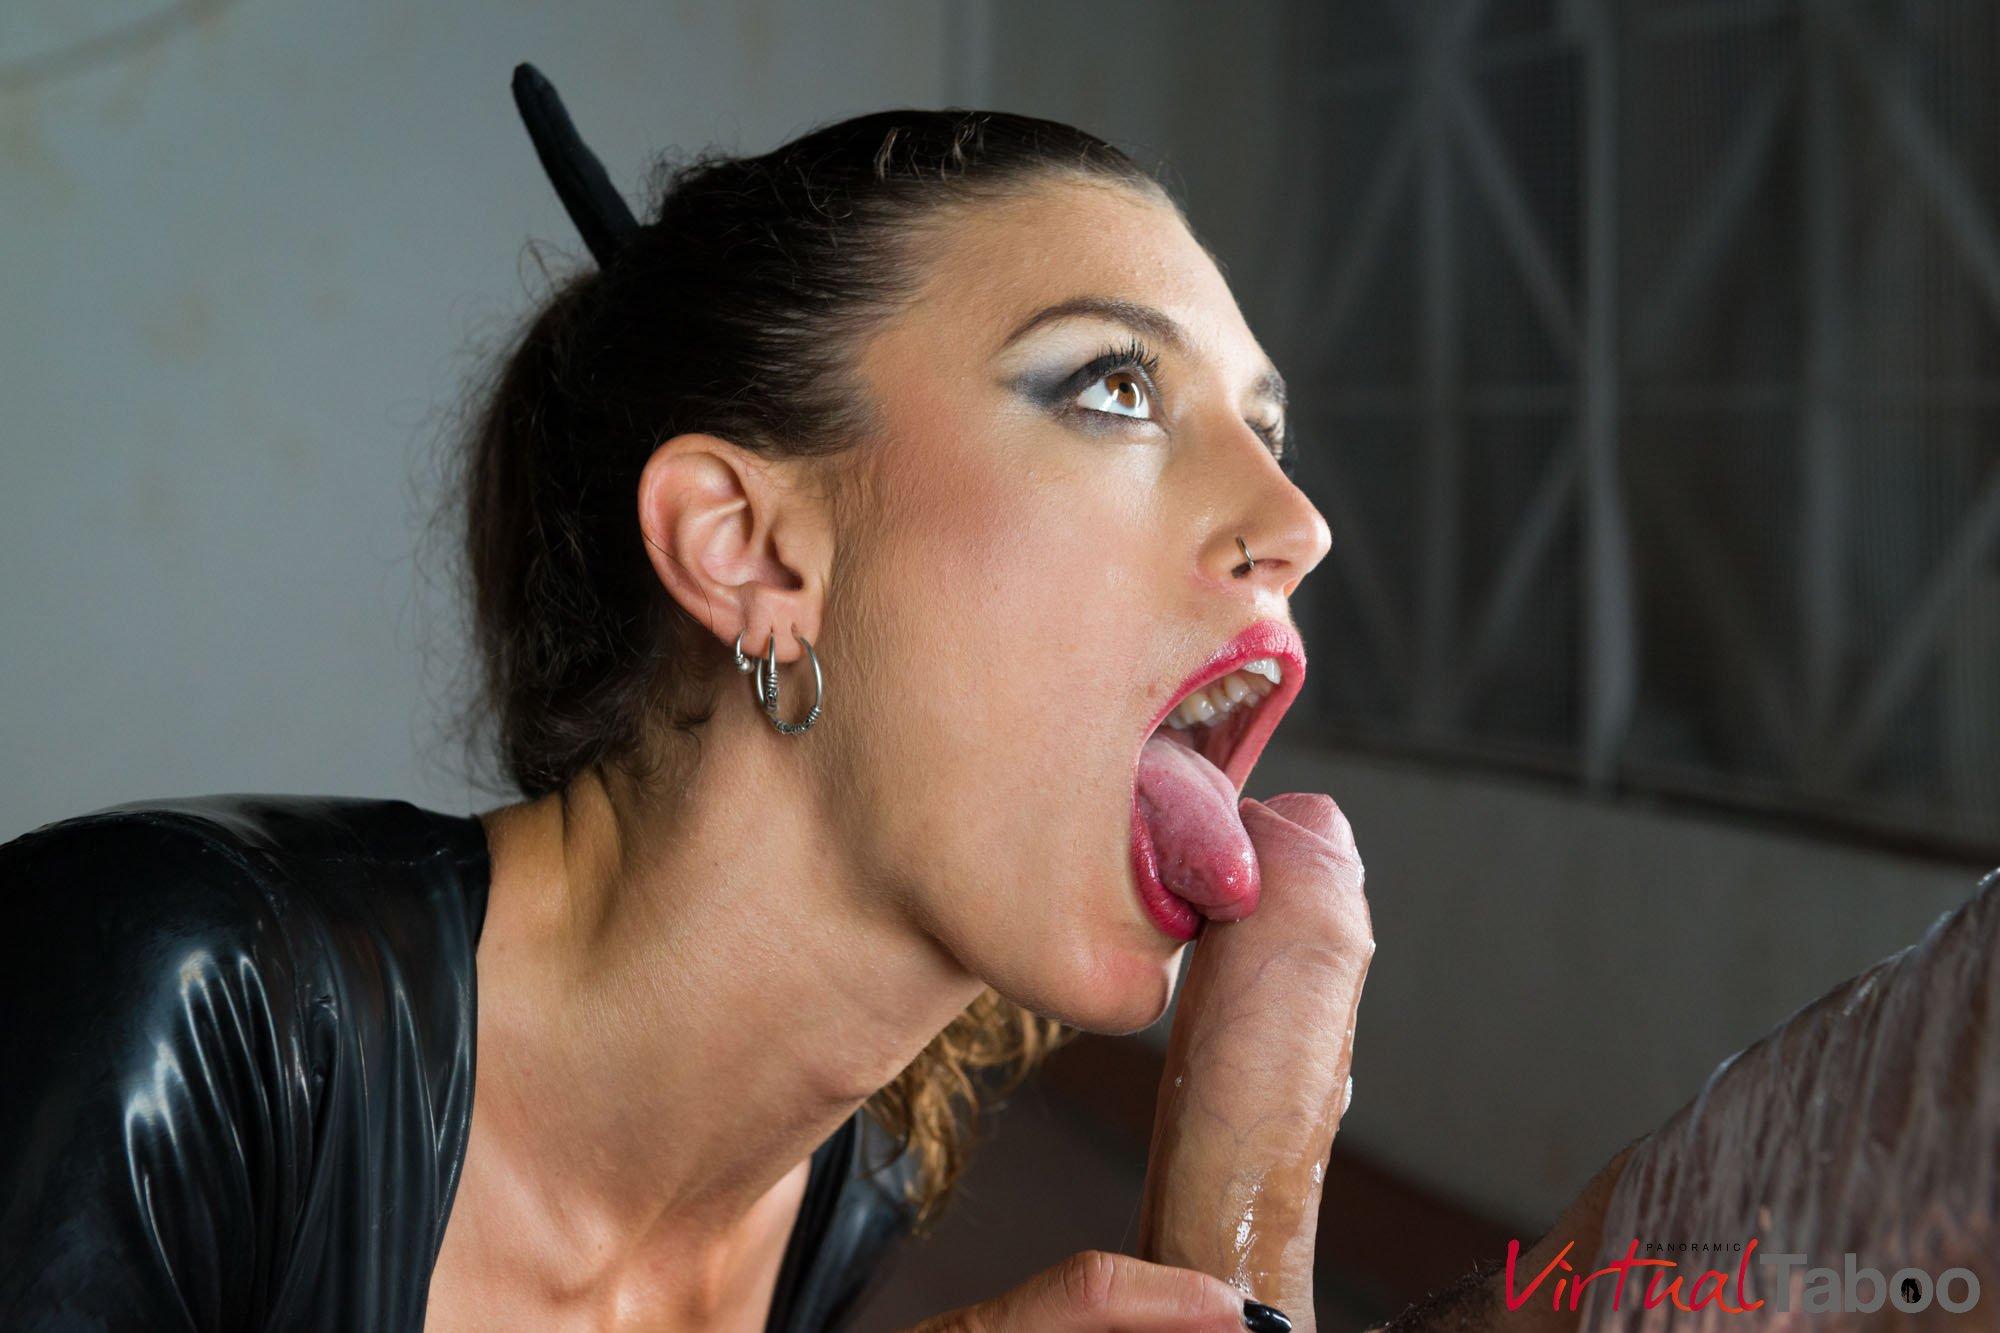 Catex Going Kinky With Julia Roca Virtualtaboo Porn Video Virtual Reality 4